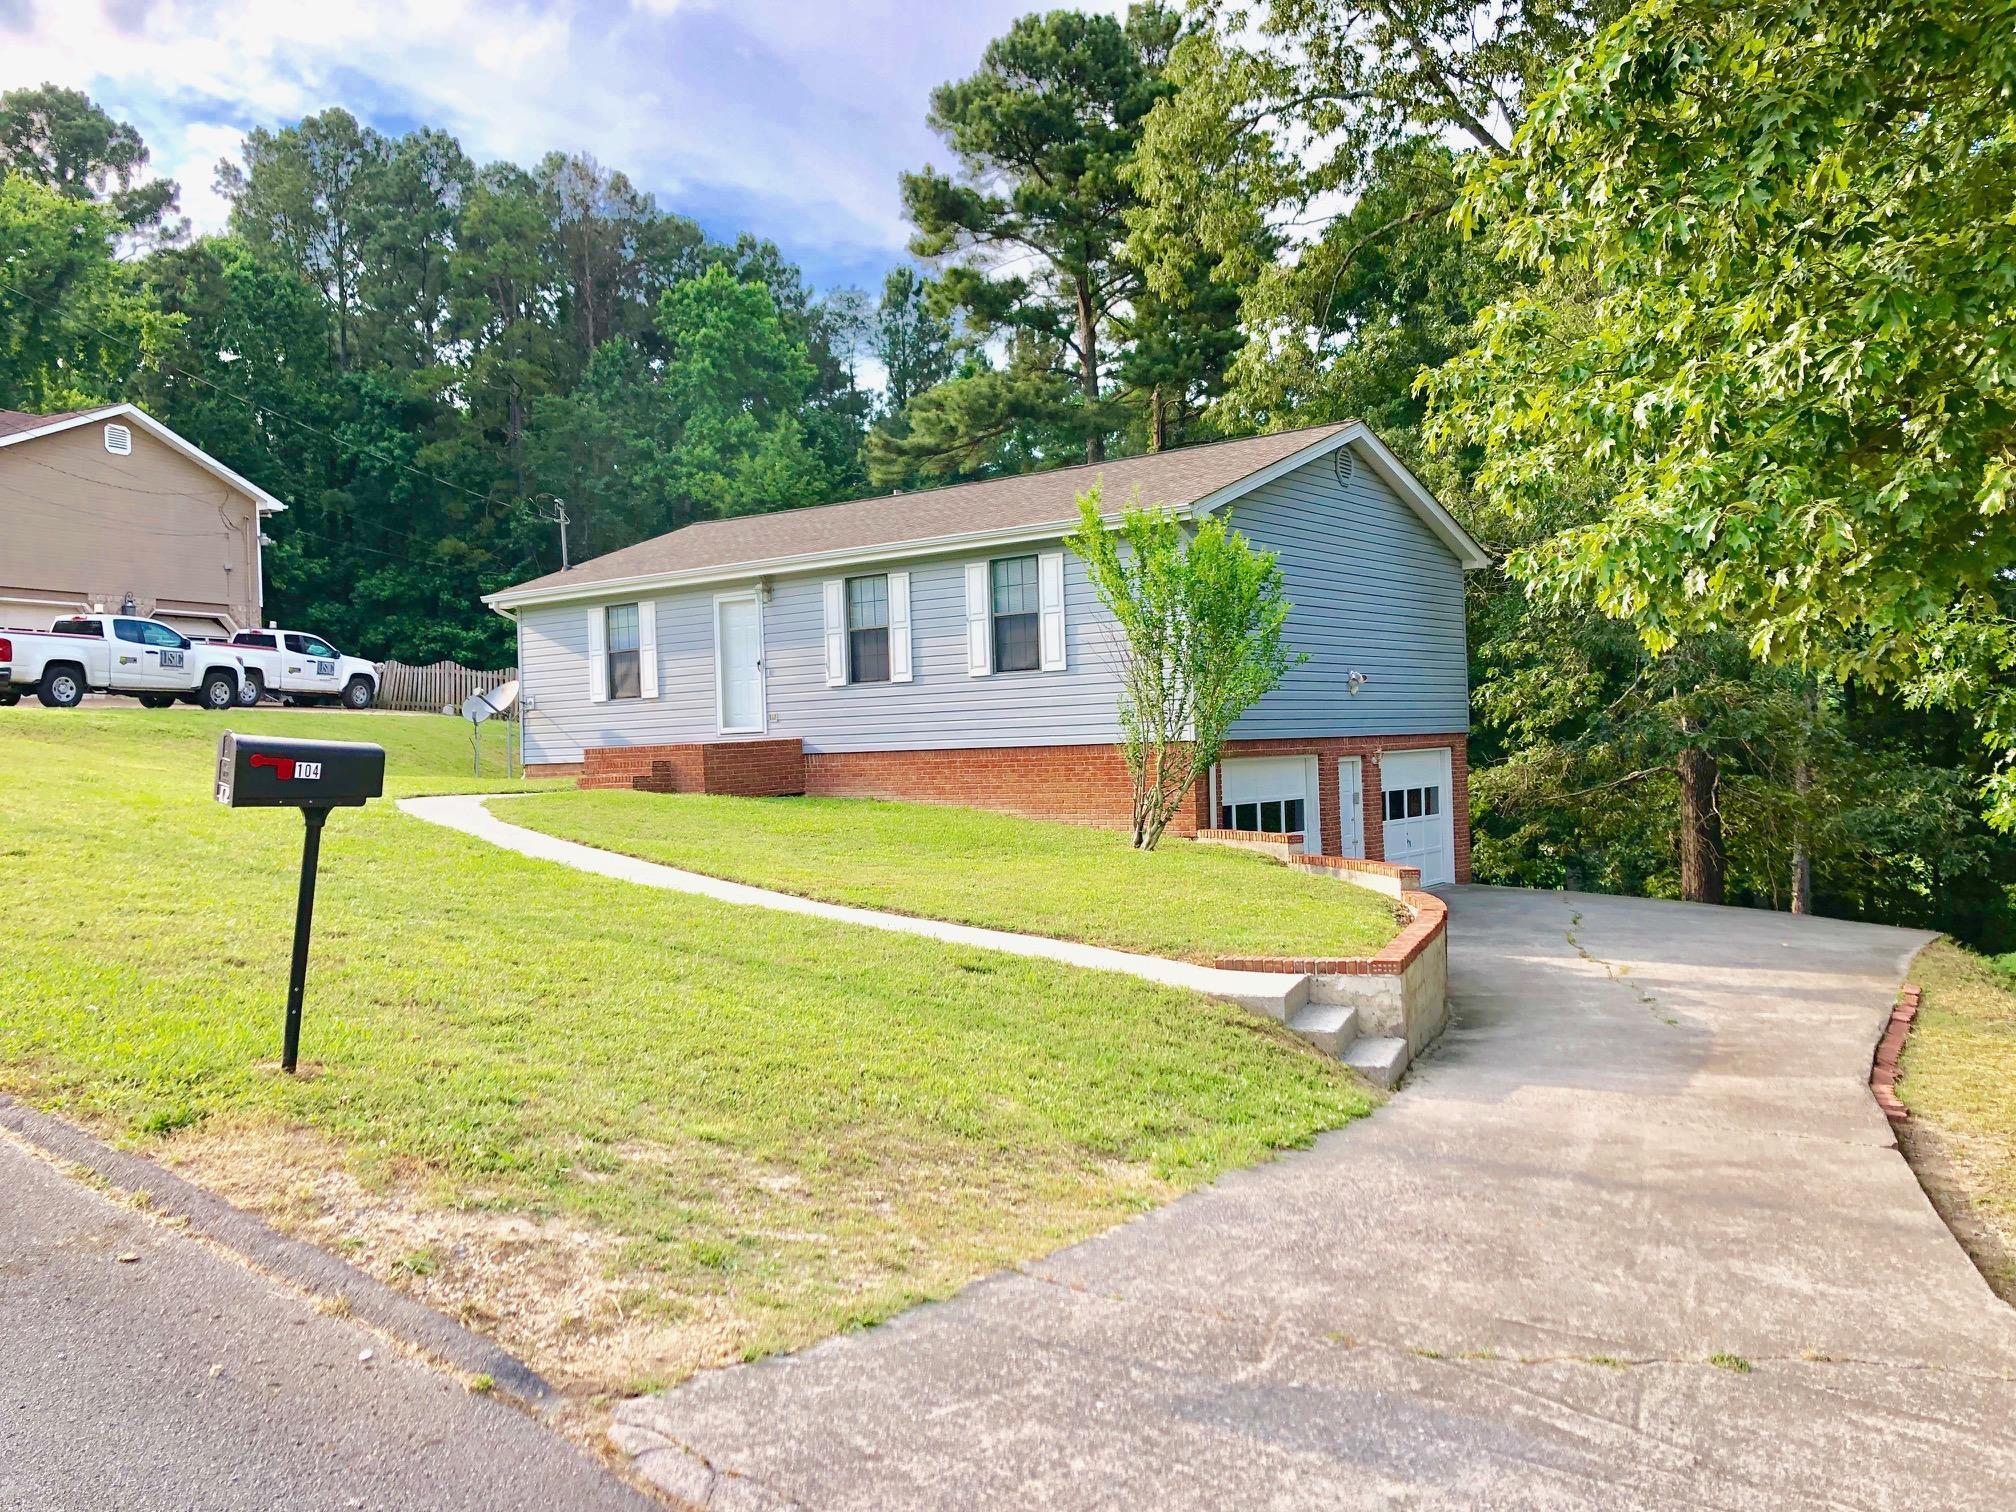 104 Ridgewood Dr, Chickamauga, GA 30707